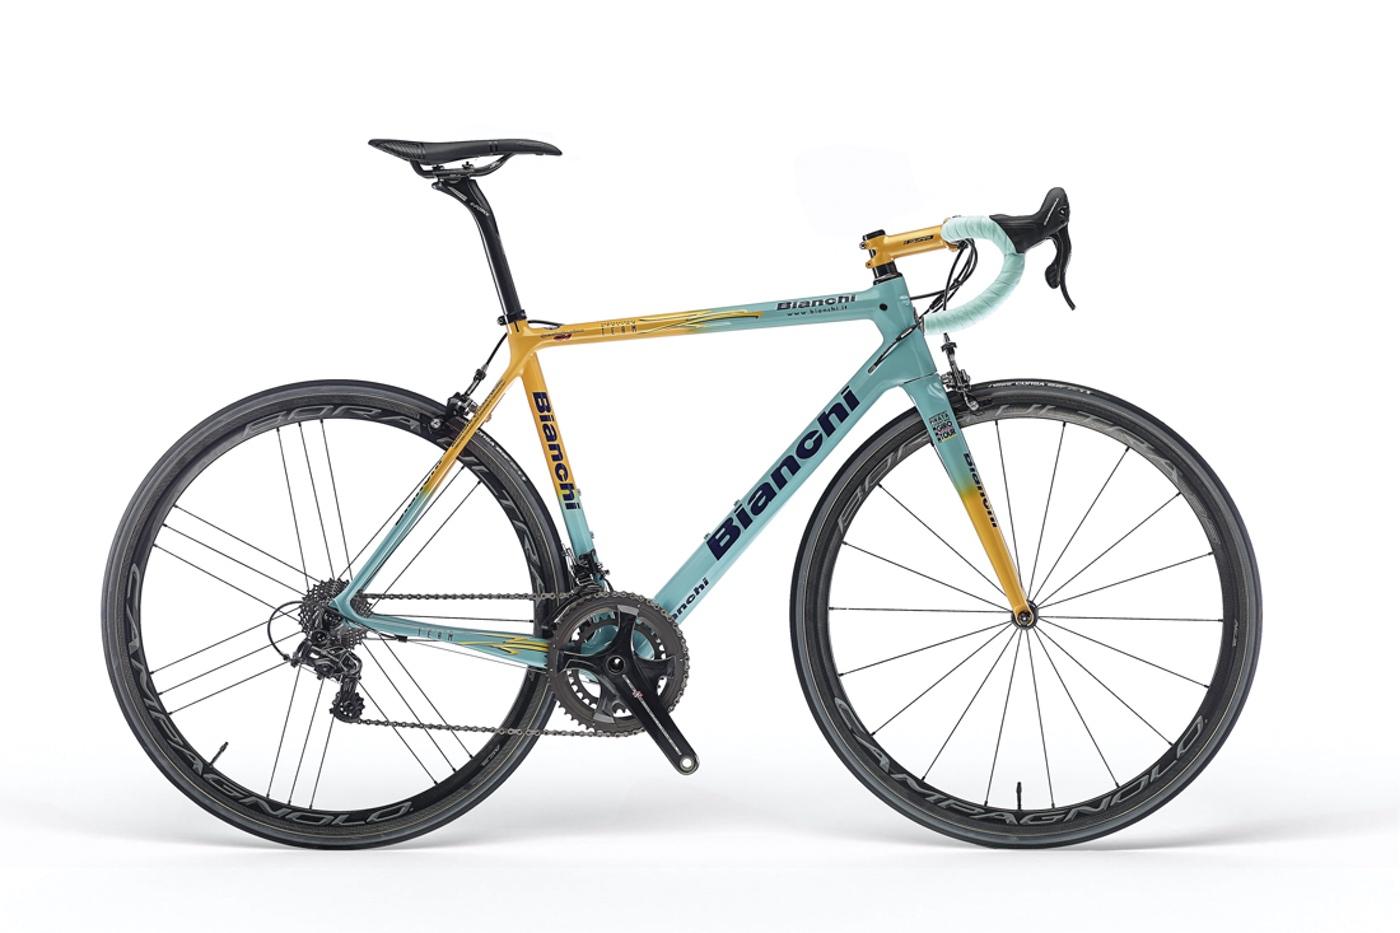 Bianchi Specialissima Pantani 20 Aniversario